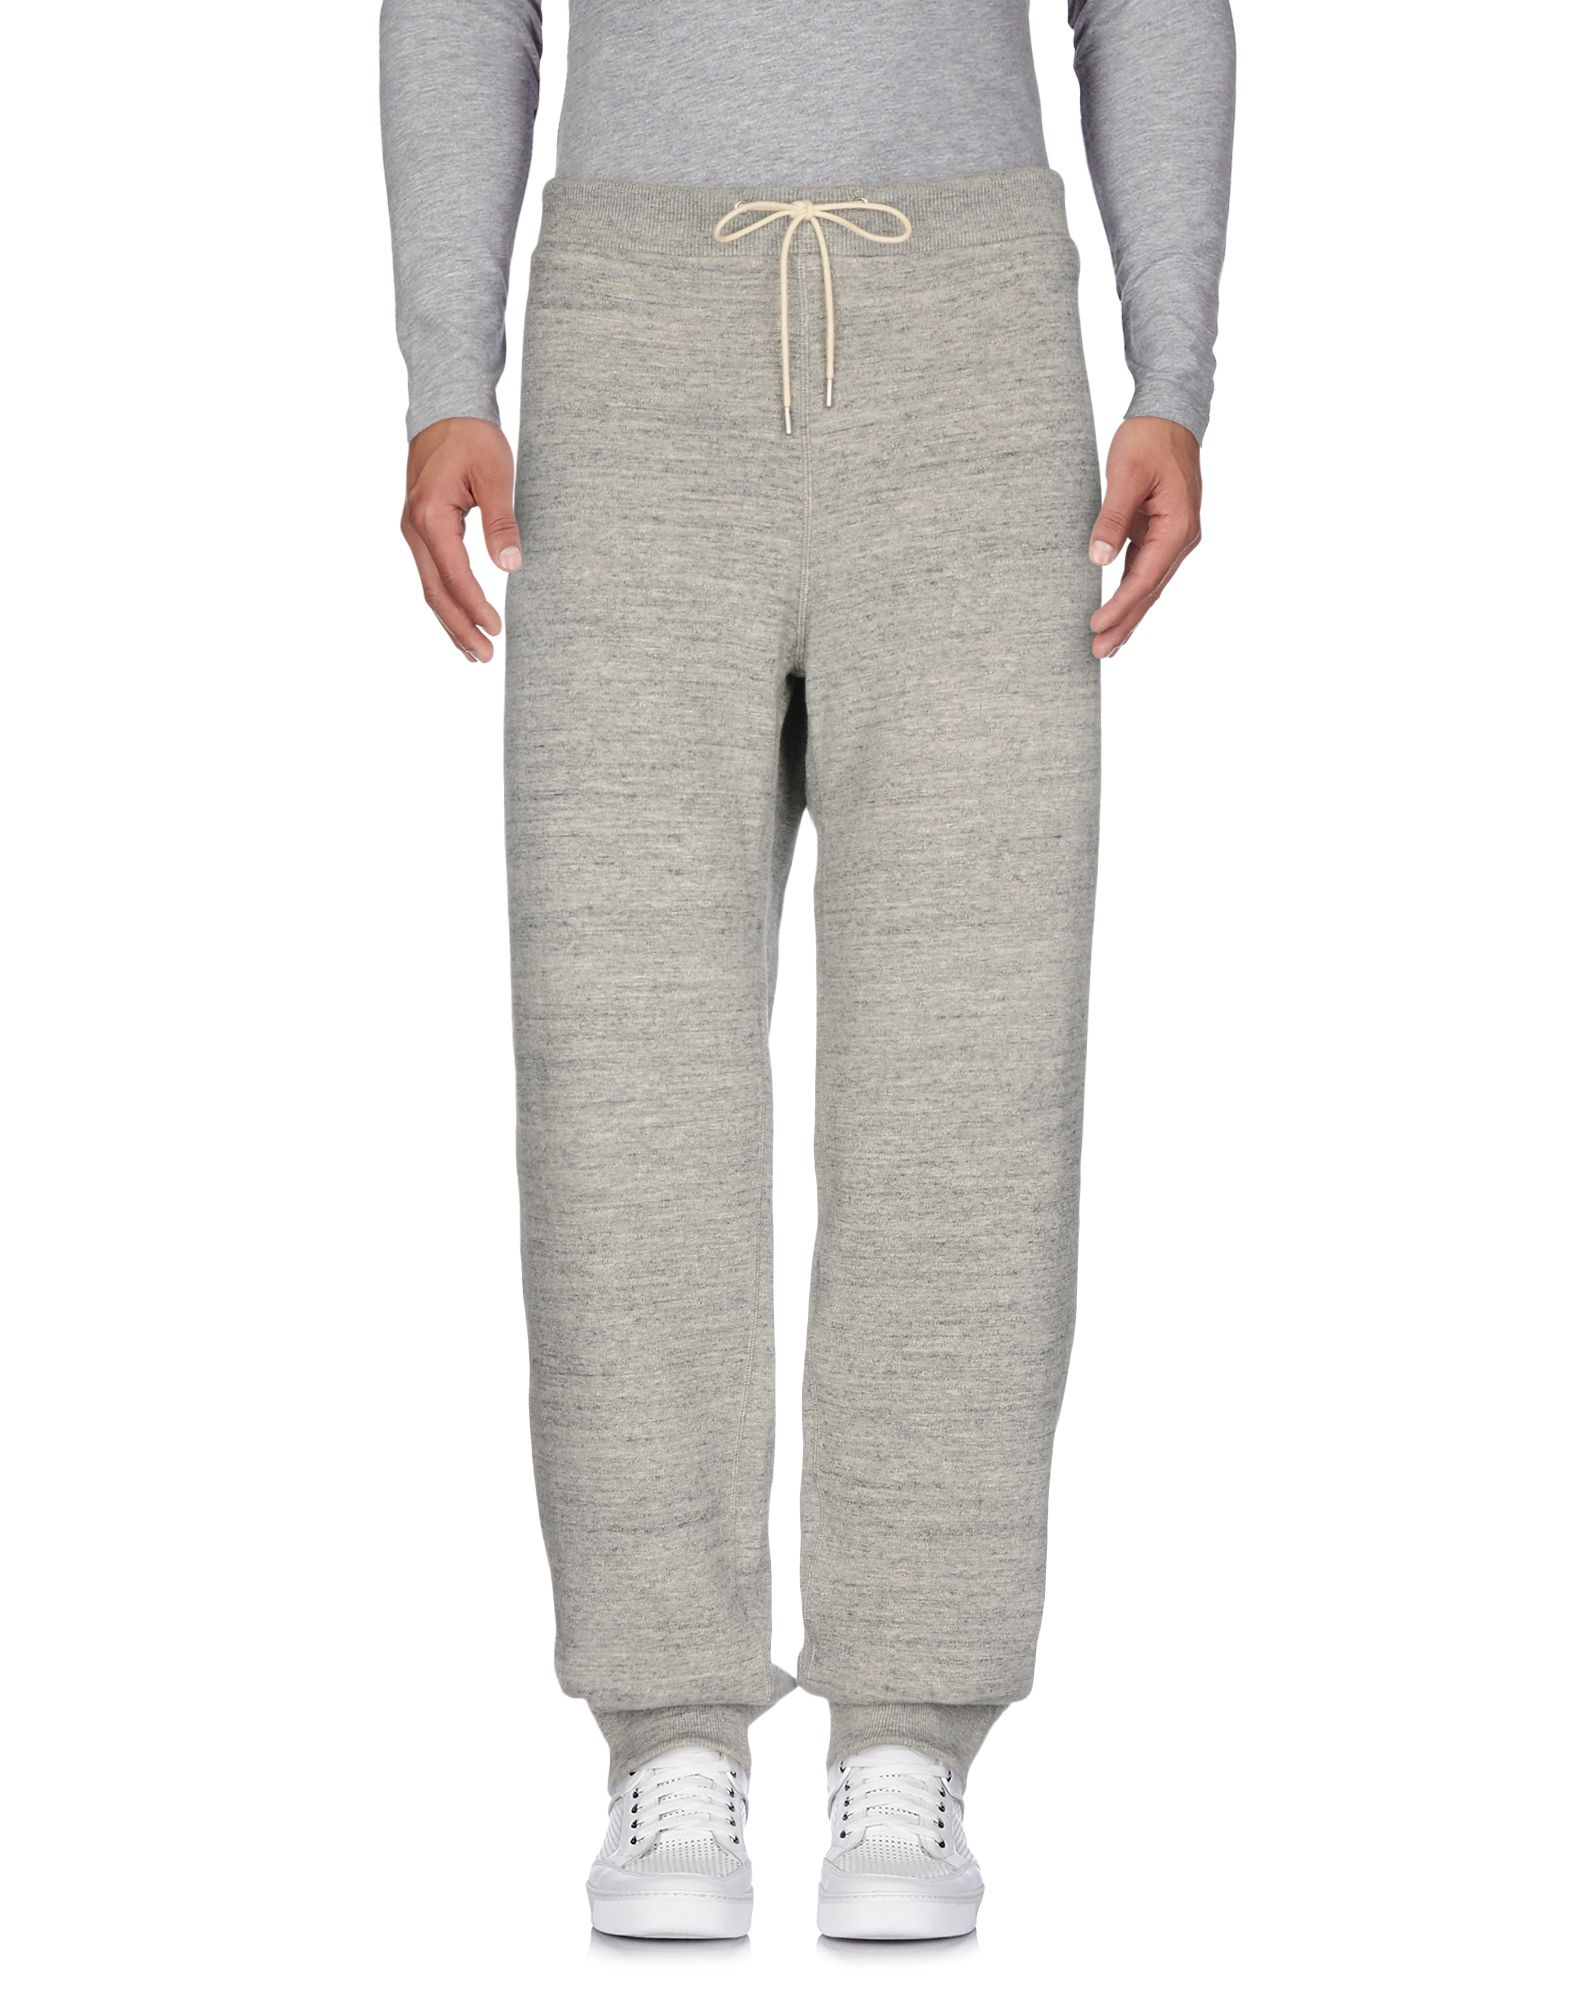 Pantalone Tom Ford Uomo - Acquista online su